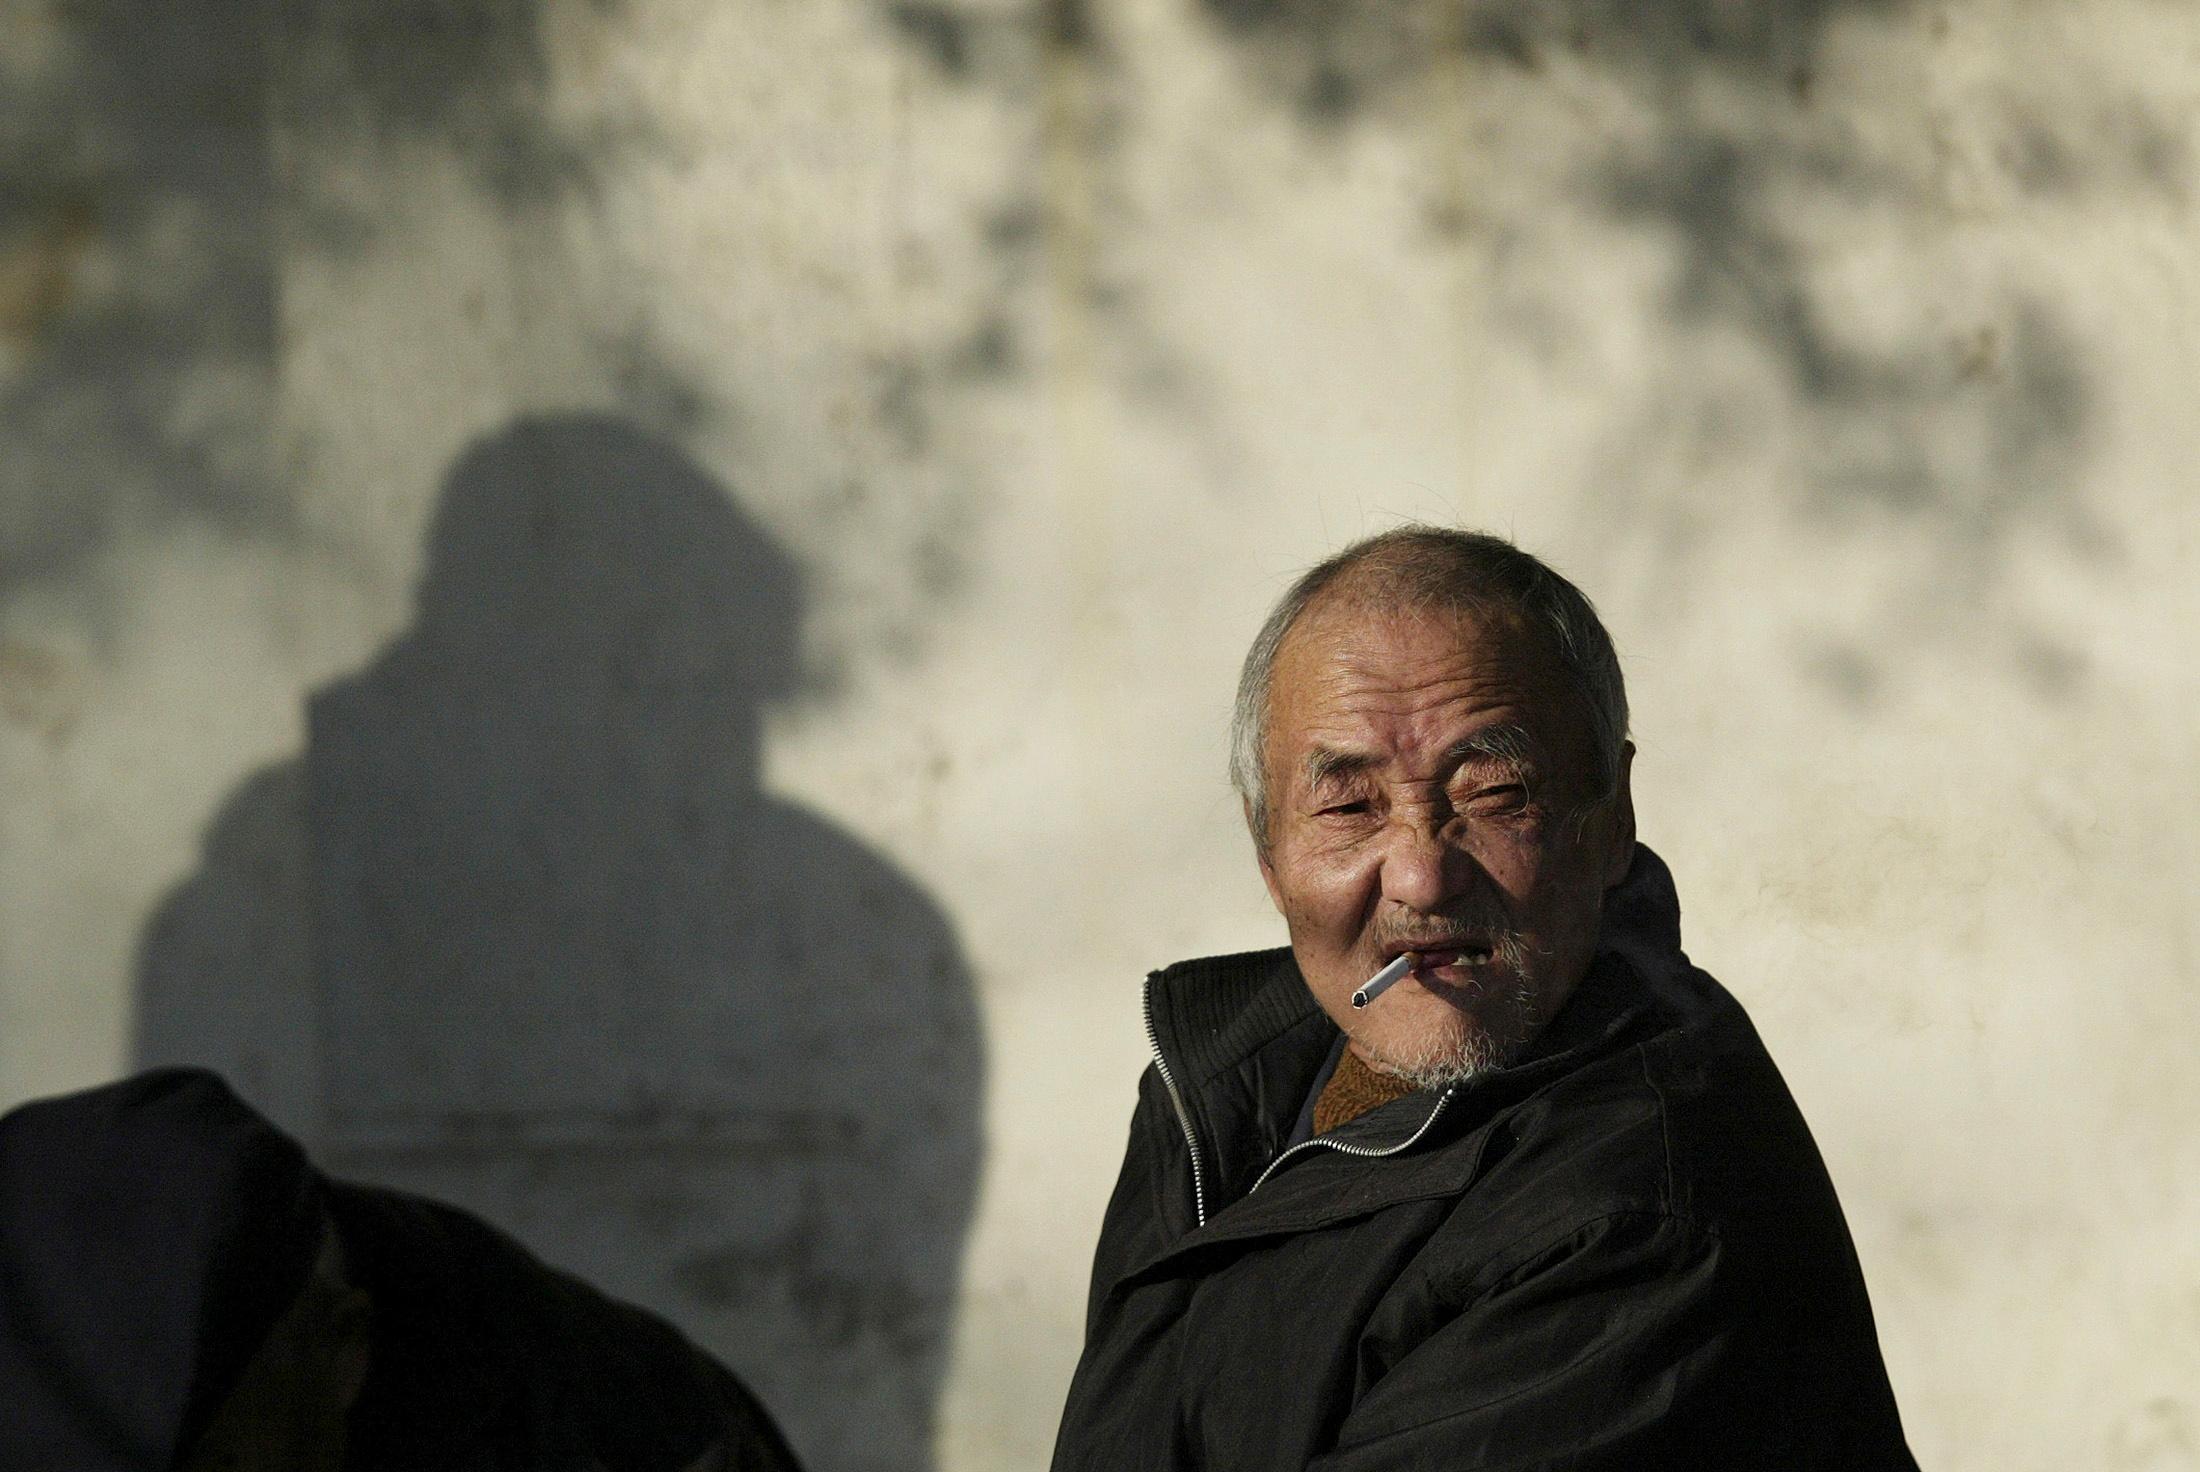 An elderly man smokes on a street in Nanjing, Jiangsu province December 27, 2010. REUTERS/Sean Yong